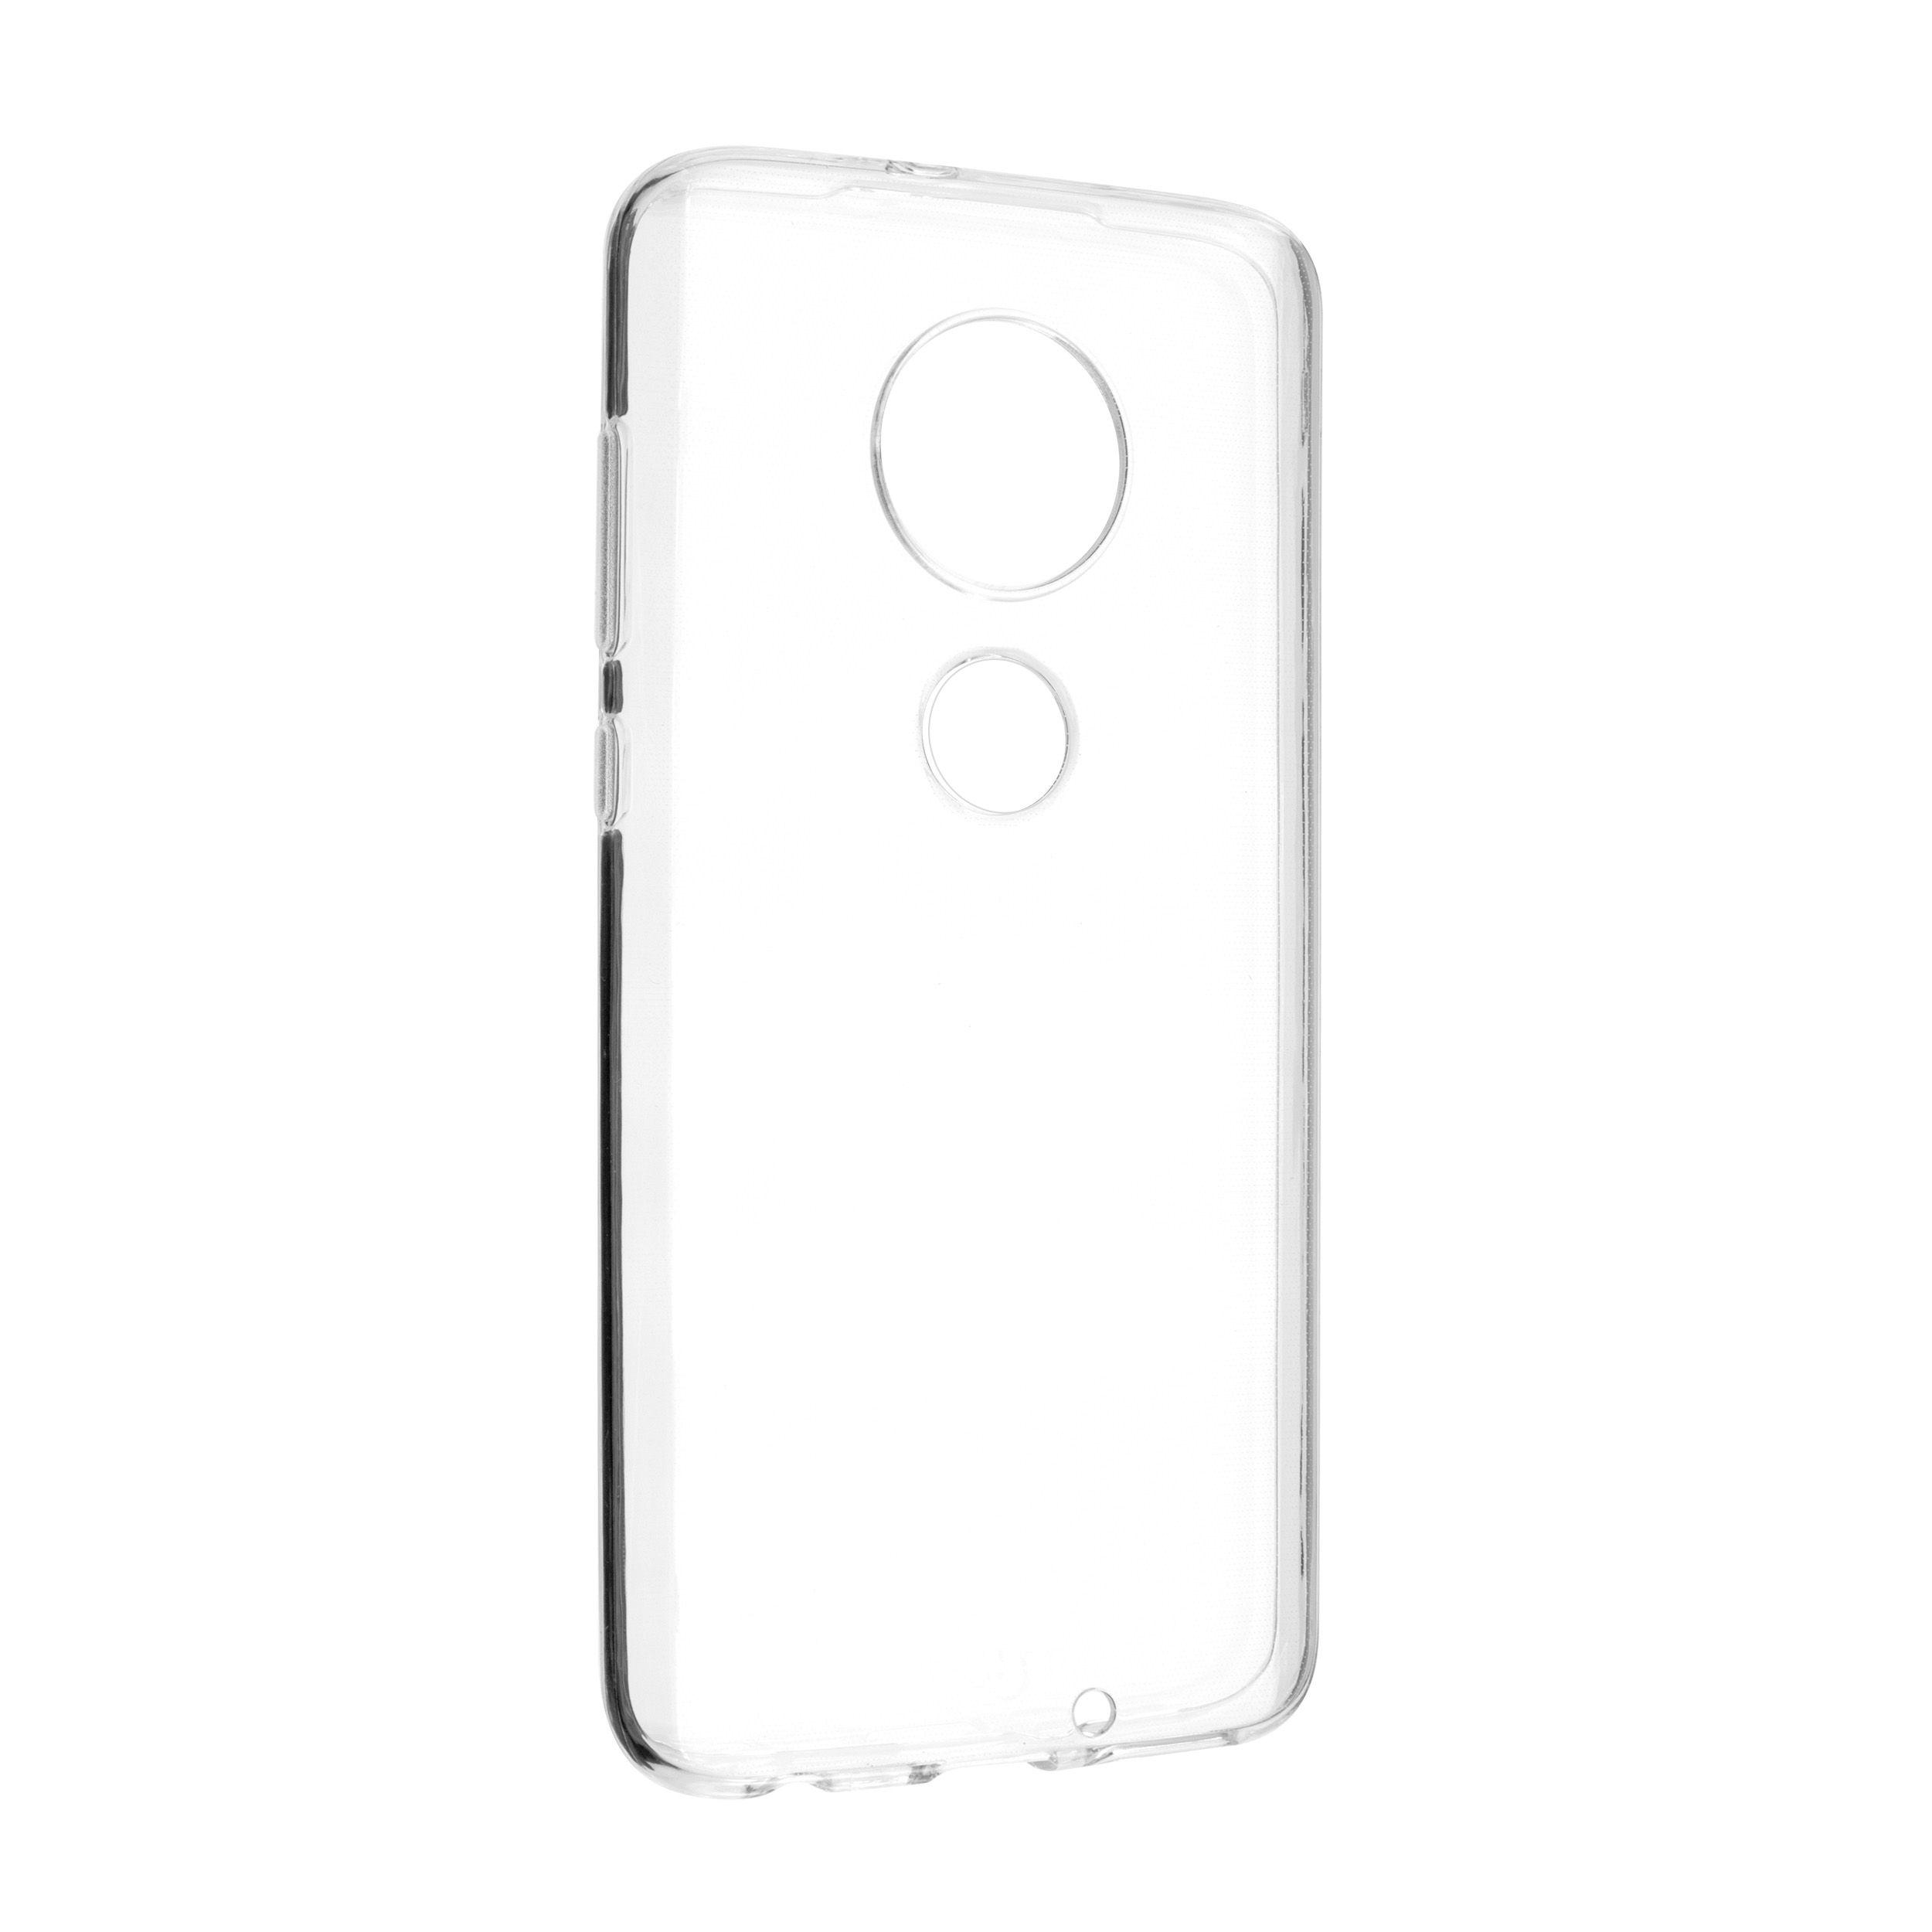 Ultratenké TPU gelové pouzdro FIXED Skin pro Motorola Moto G7, 0,6 mm, čiré